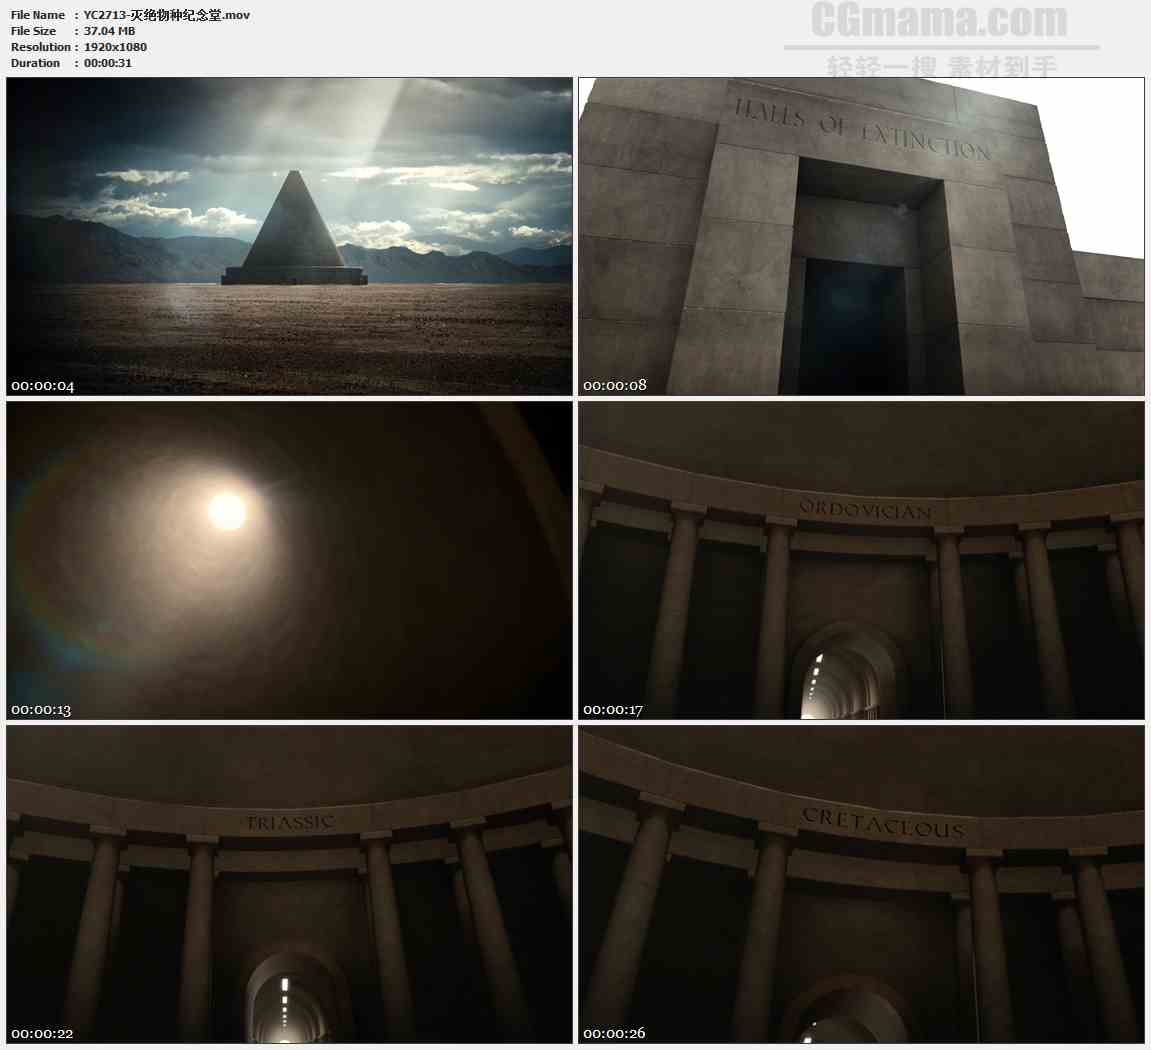 YC2713-灭绝物种纪念堂高清实拍视频素材